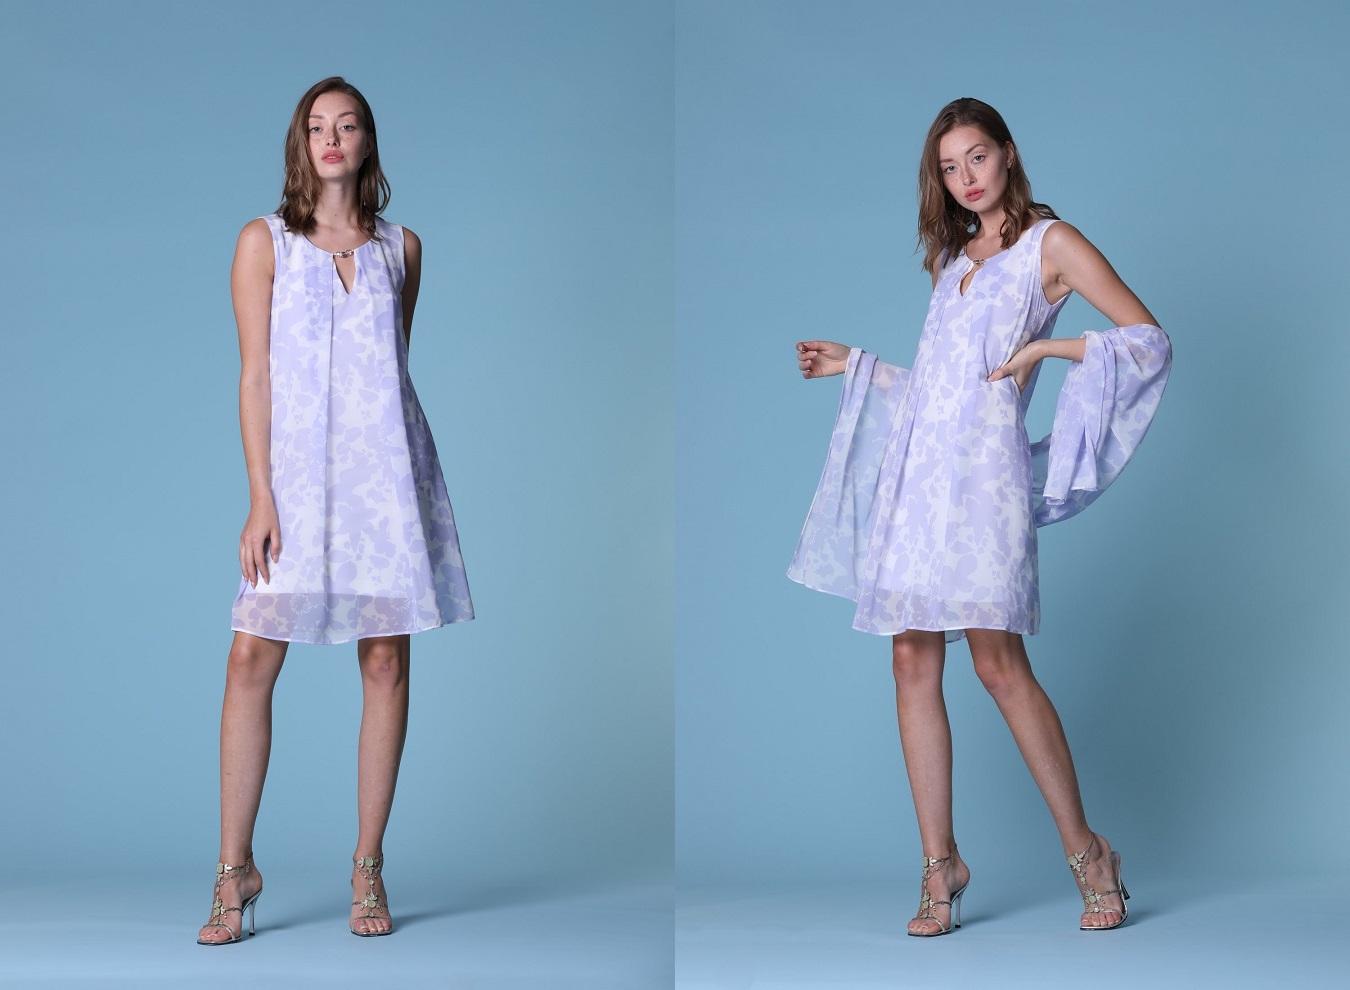 abbigliamento donna elegante Parma